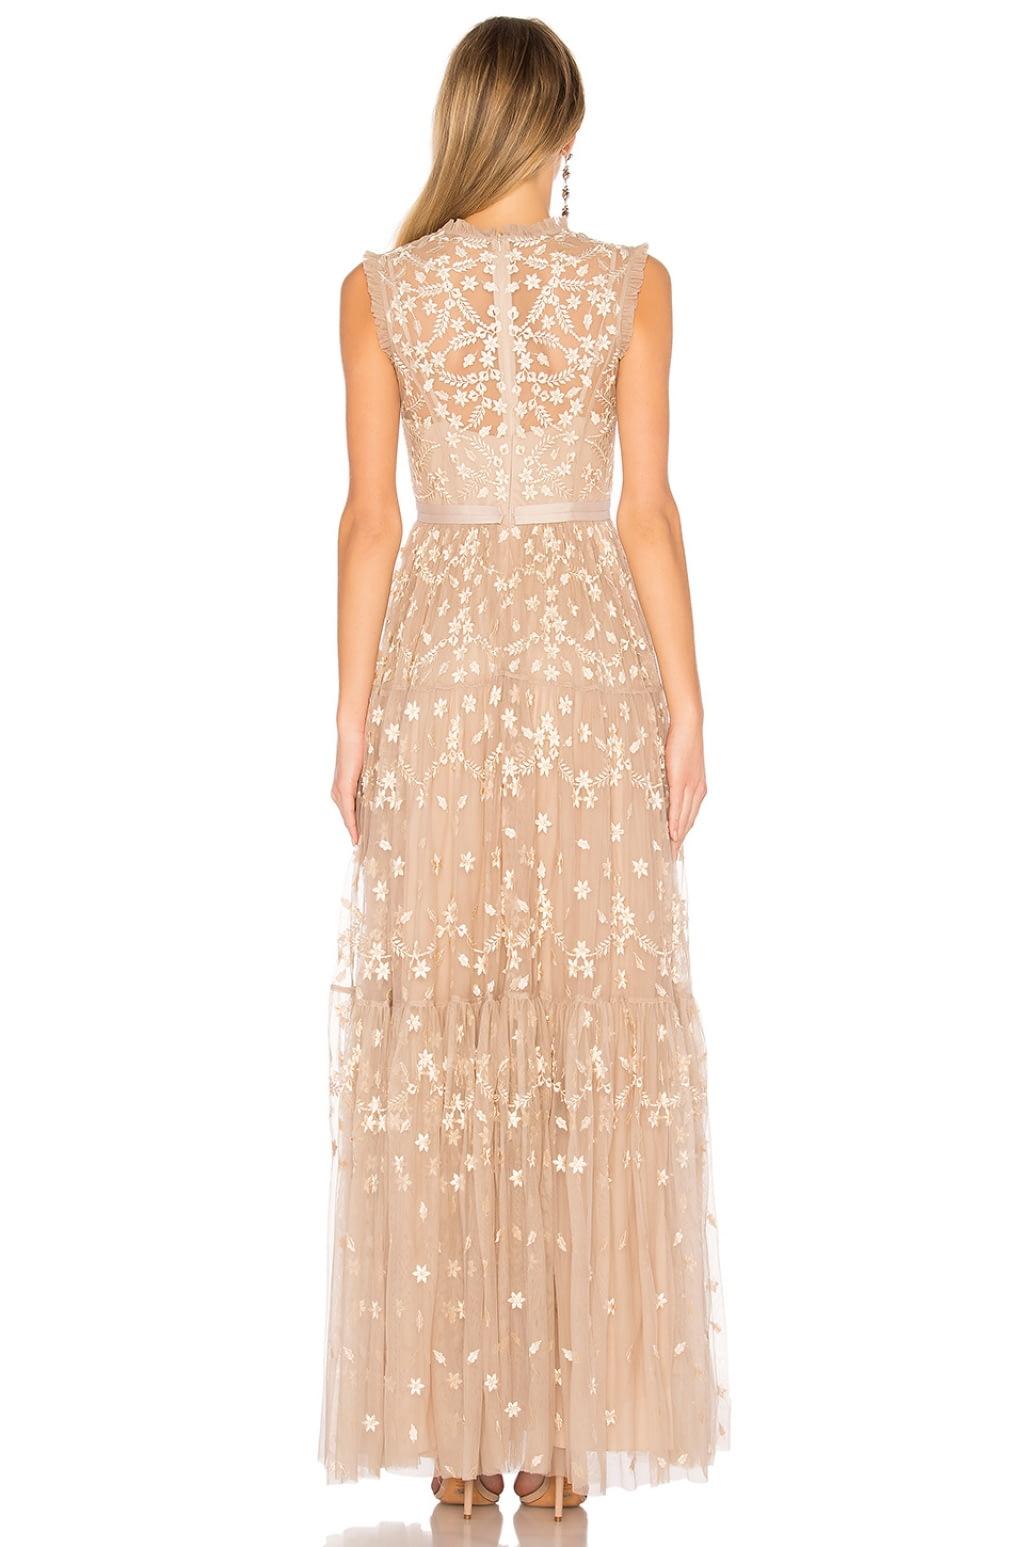 Buy Original Needle & Thread Clover Gown at Indonesia | BOBOBOBO